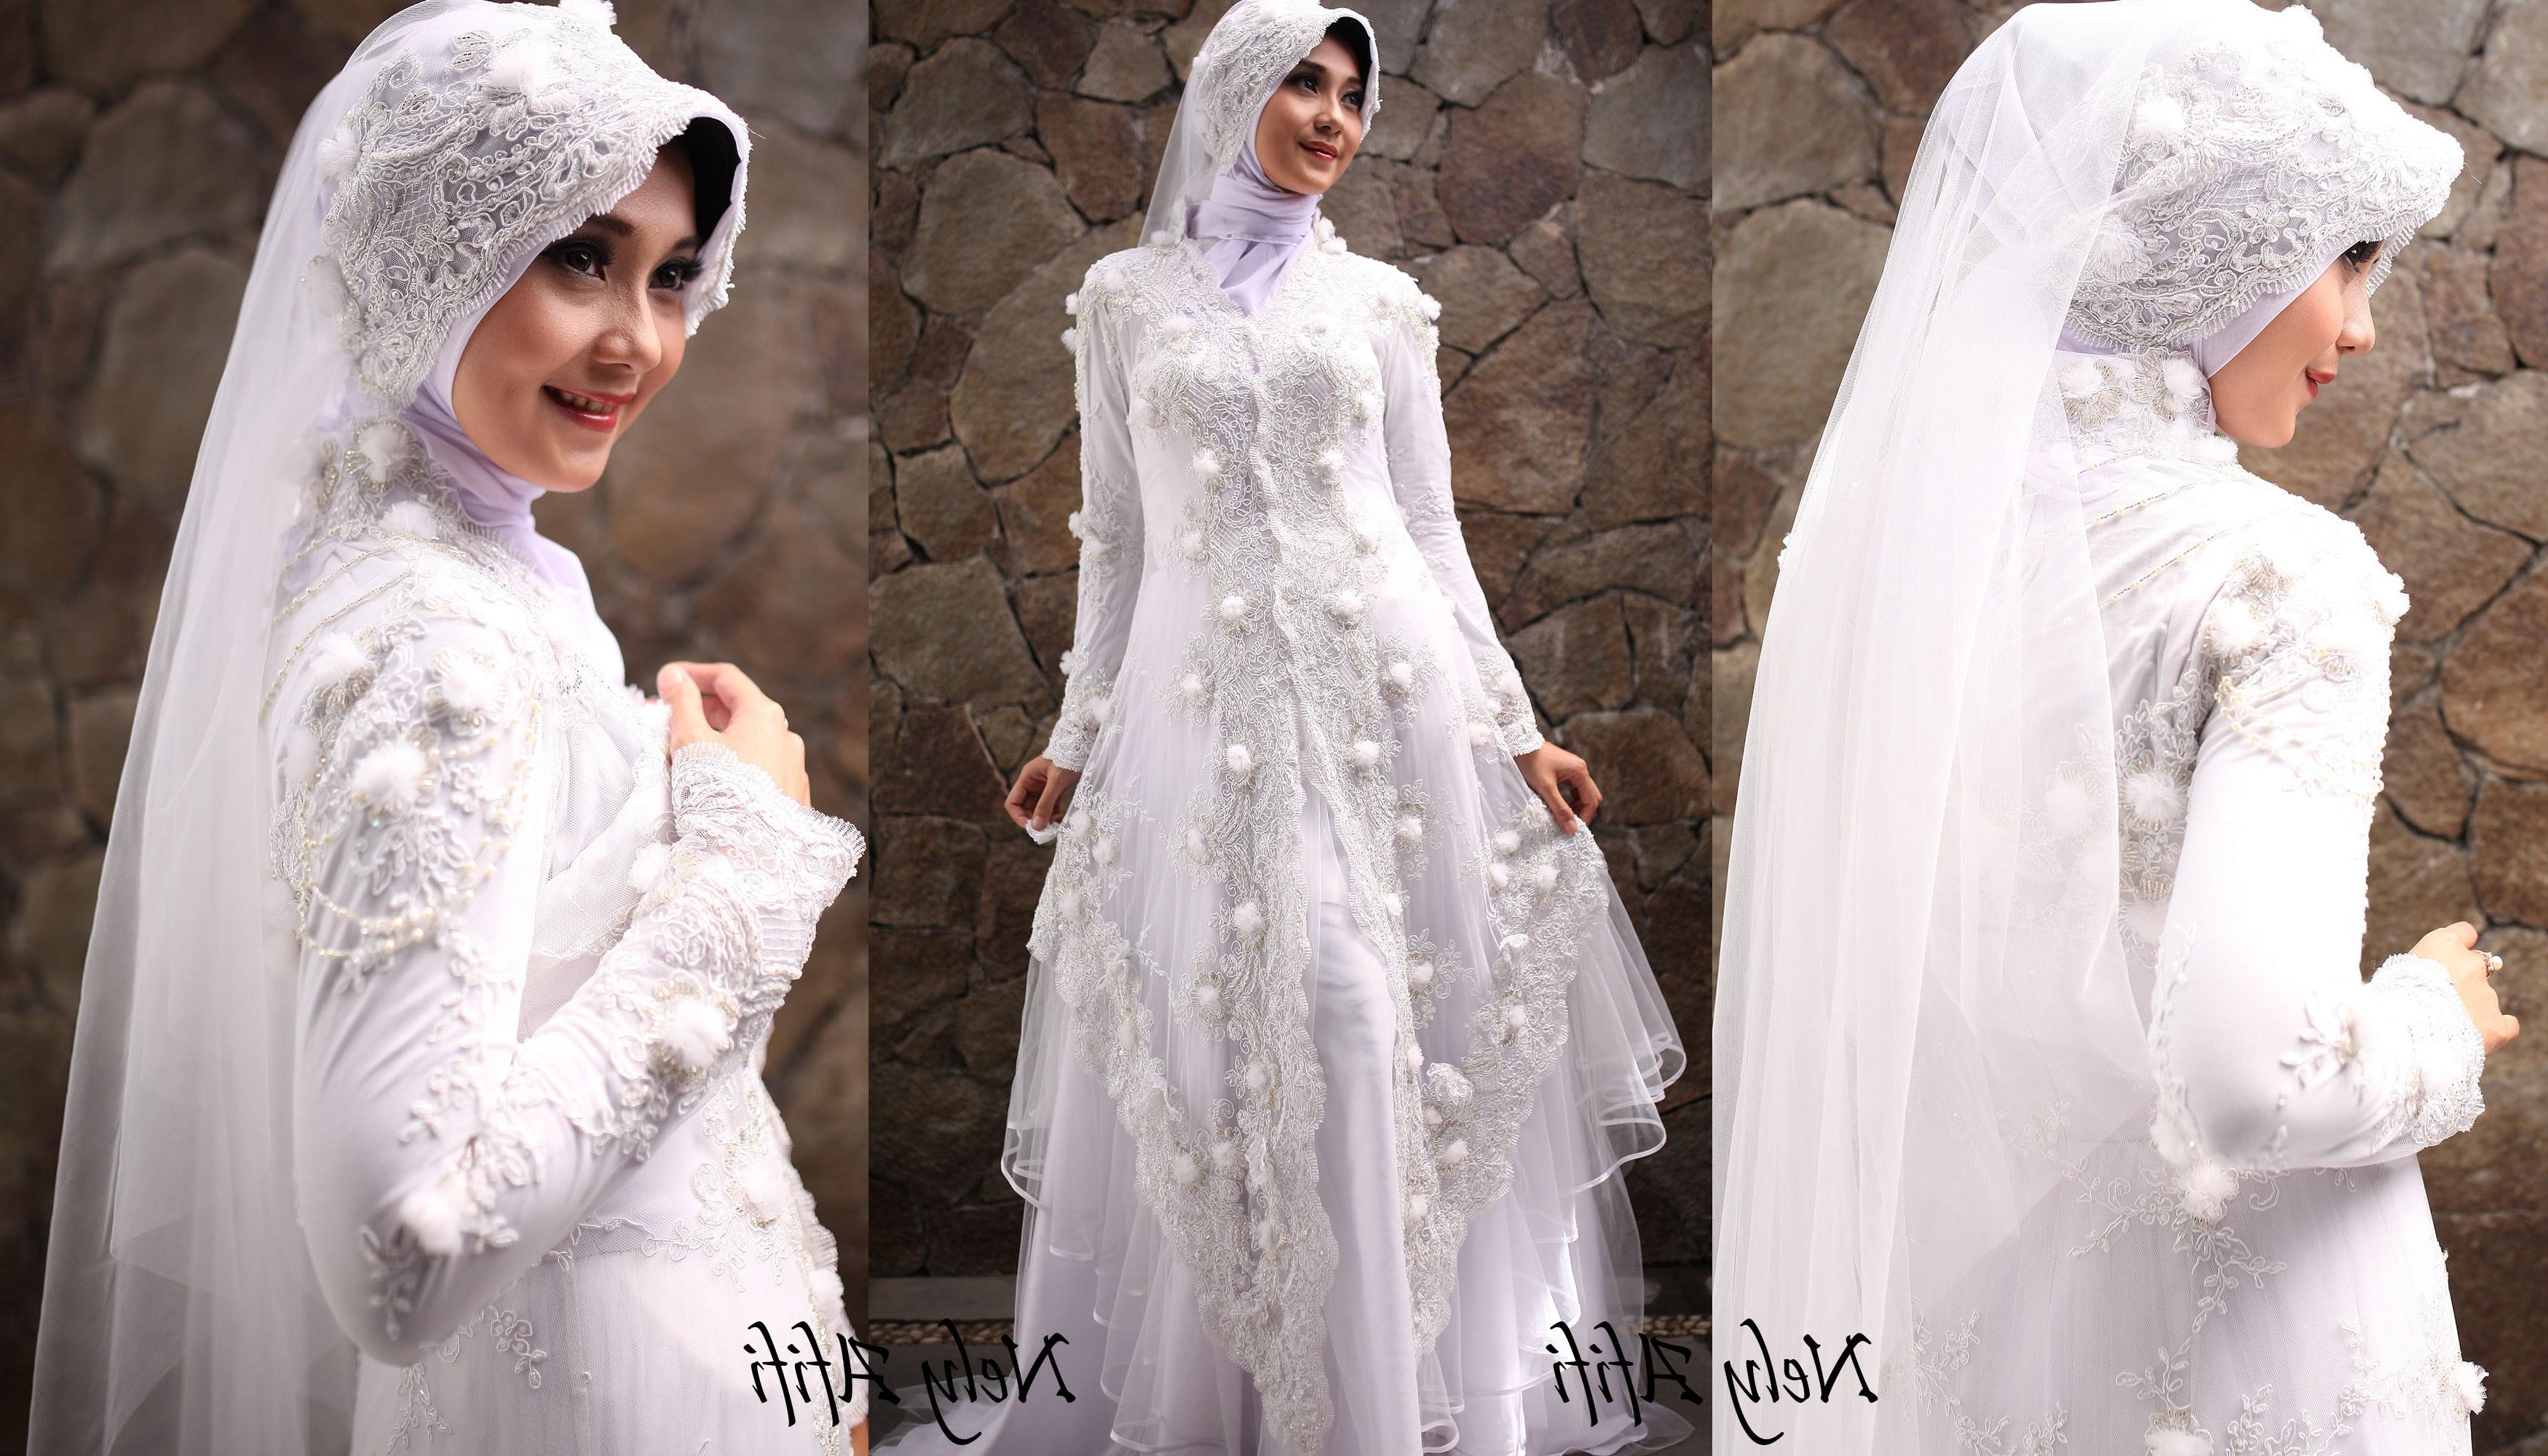 Bentuk Sewa Gaun Pengantin Muslimah Murah Irdz Kebaya Muslim Putih Pengantin Putu Merry